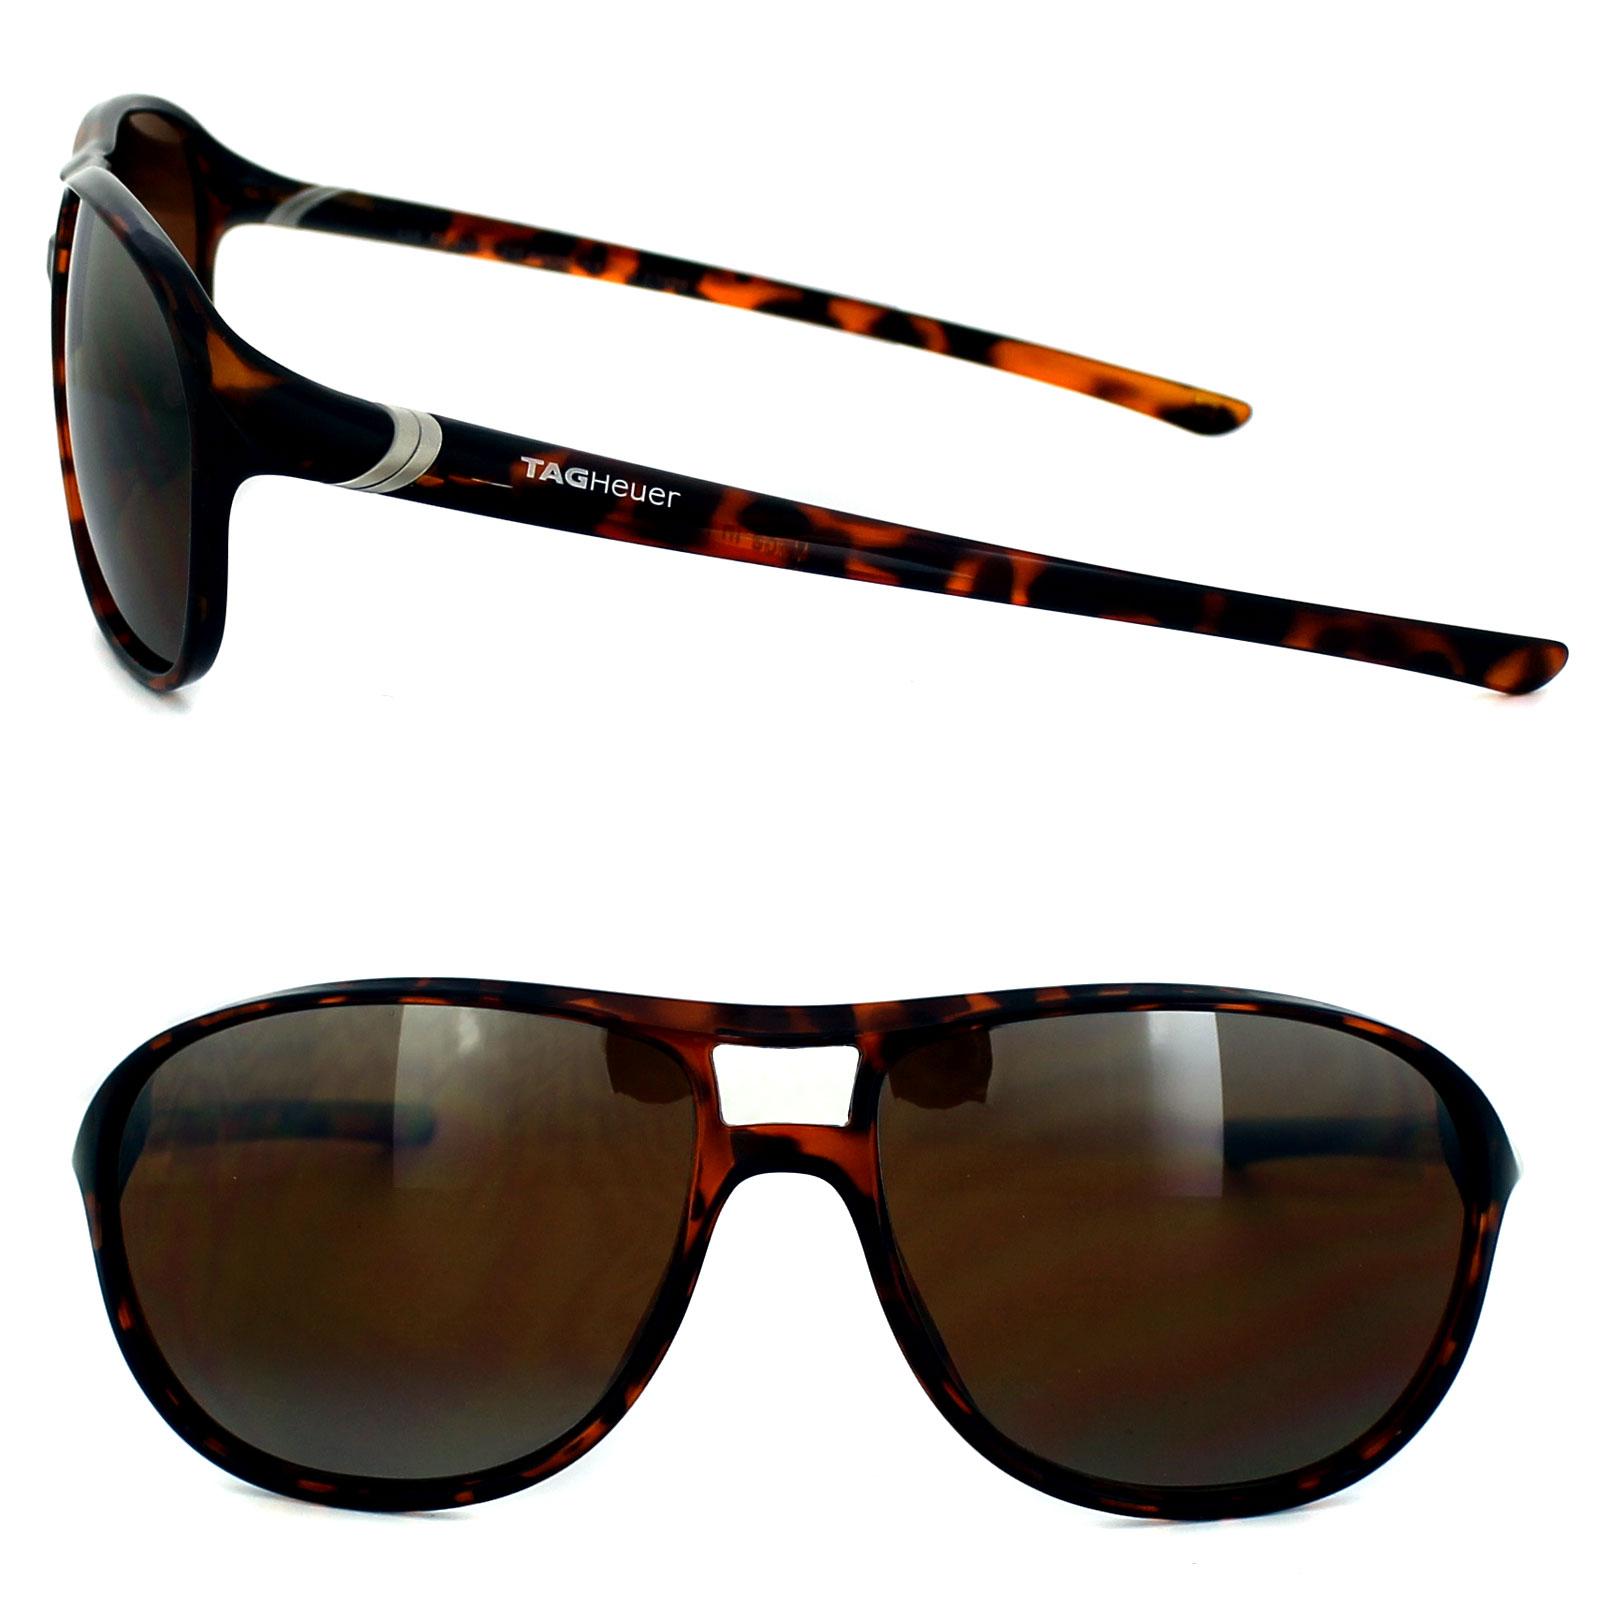 c276442ba41 Tag Heuer 27 Degree Sunglasses Review « Heritage Malta